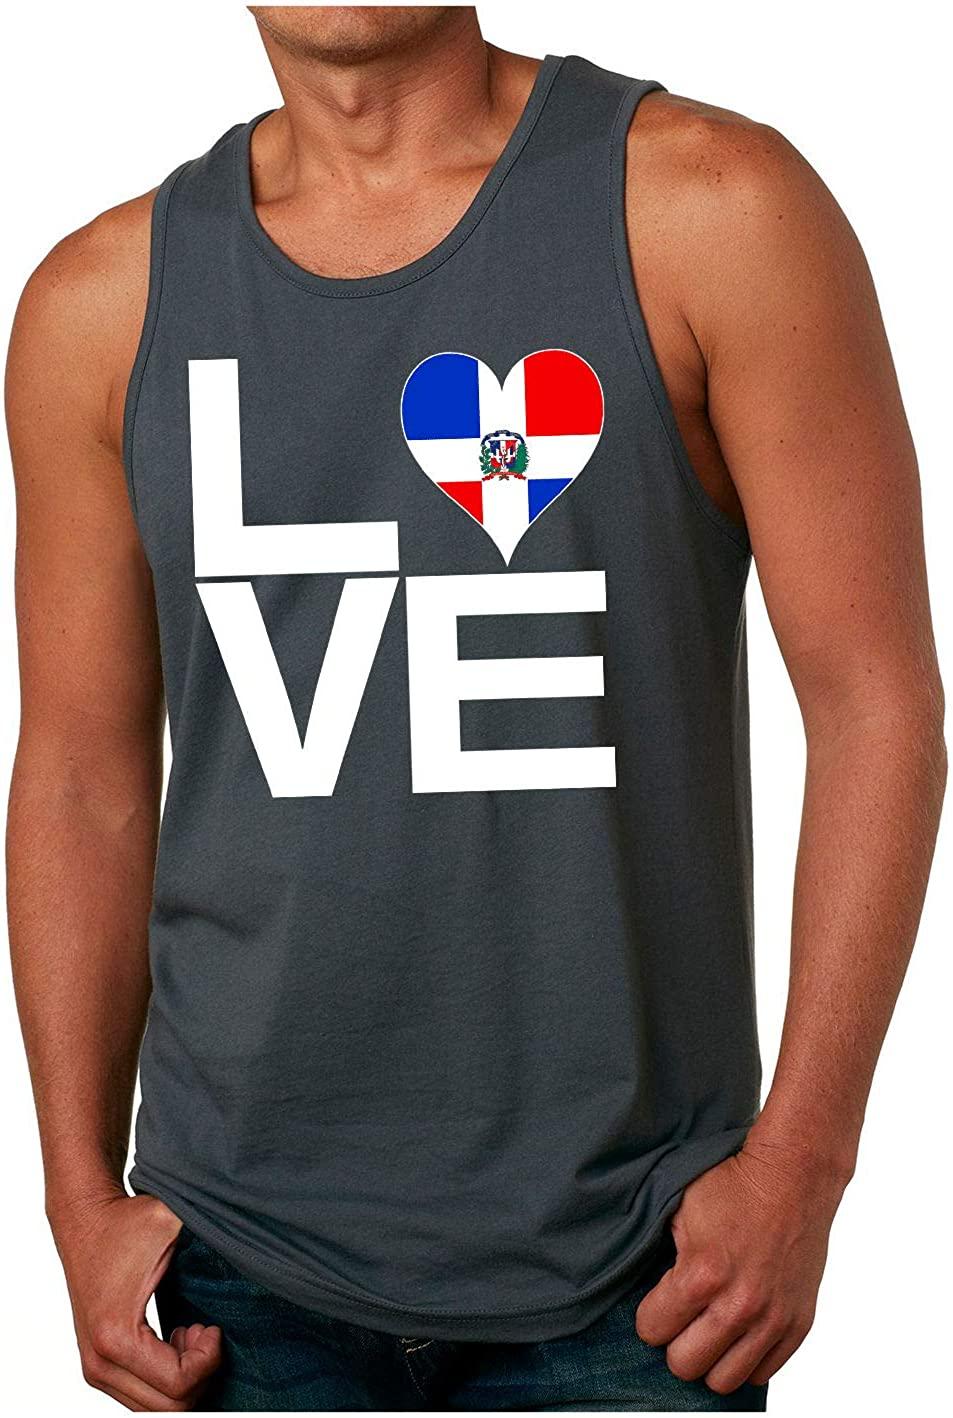 HARD EDGE DESIGN Men's Love Block Dominican Republic Heart Tank Top, Small, Heavy Metal